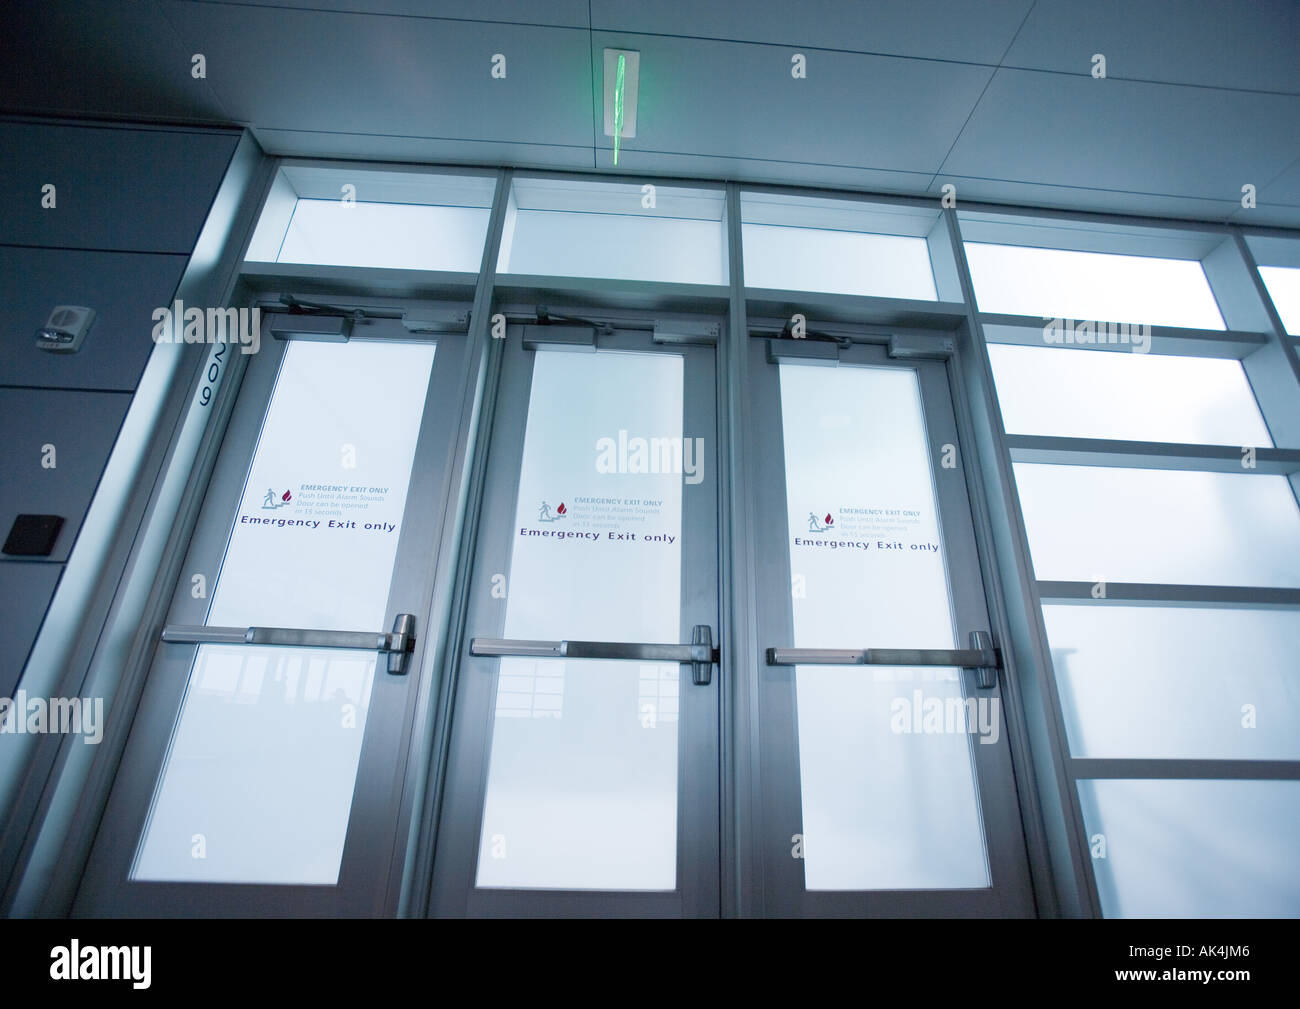 Emergency exit doors & Emergency exit doors Stock Photo: 8504773 - Alamy